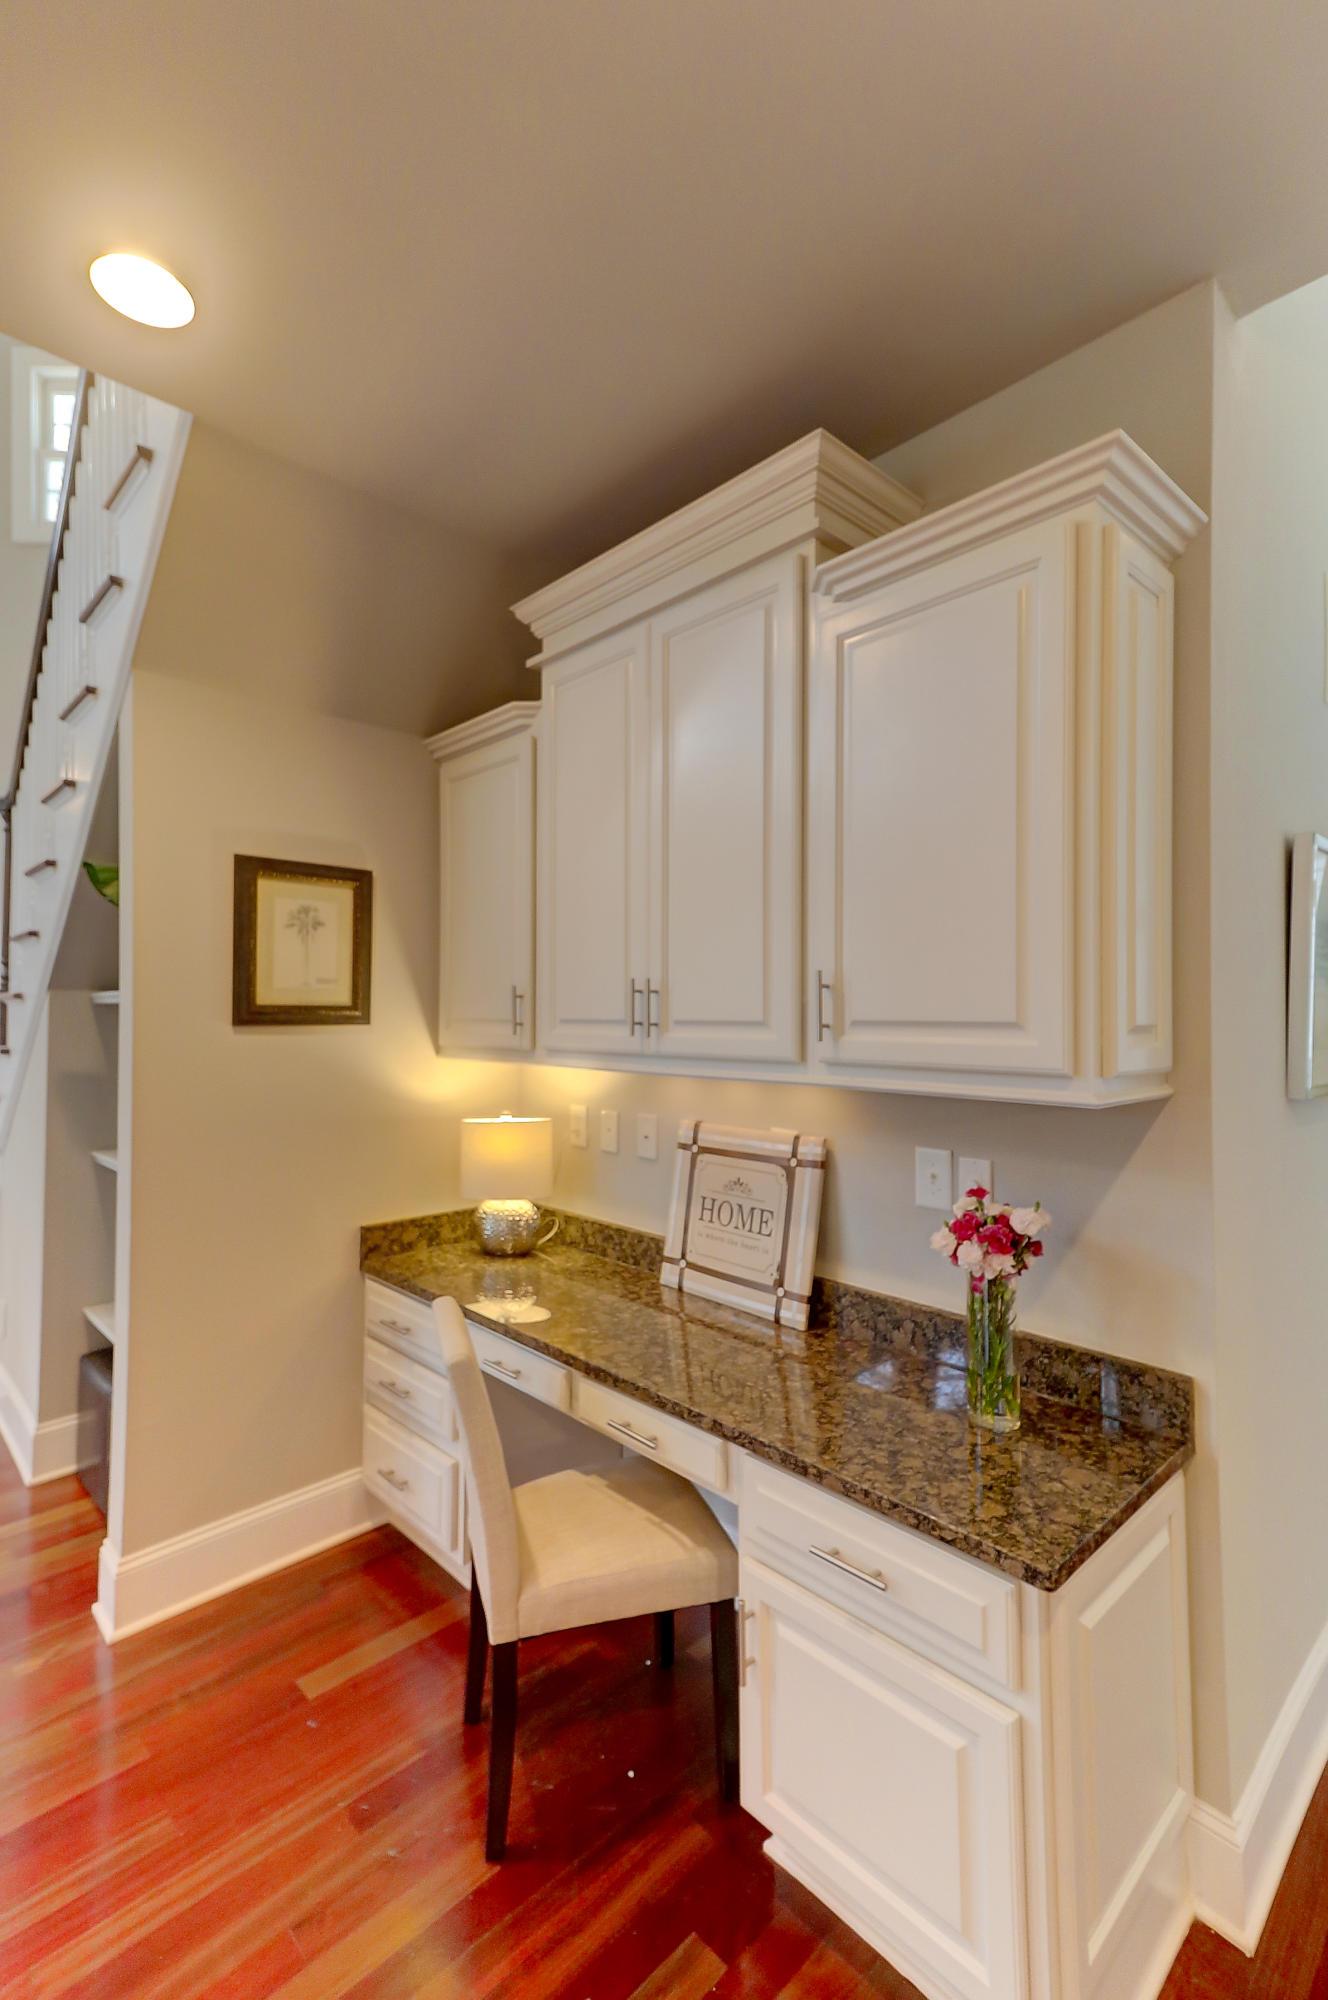 Dunes West Homes For Sale - 2996 Pignatelli Crescent, Mount Pleasant, SC - 120